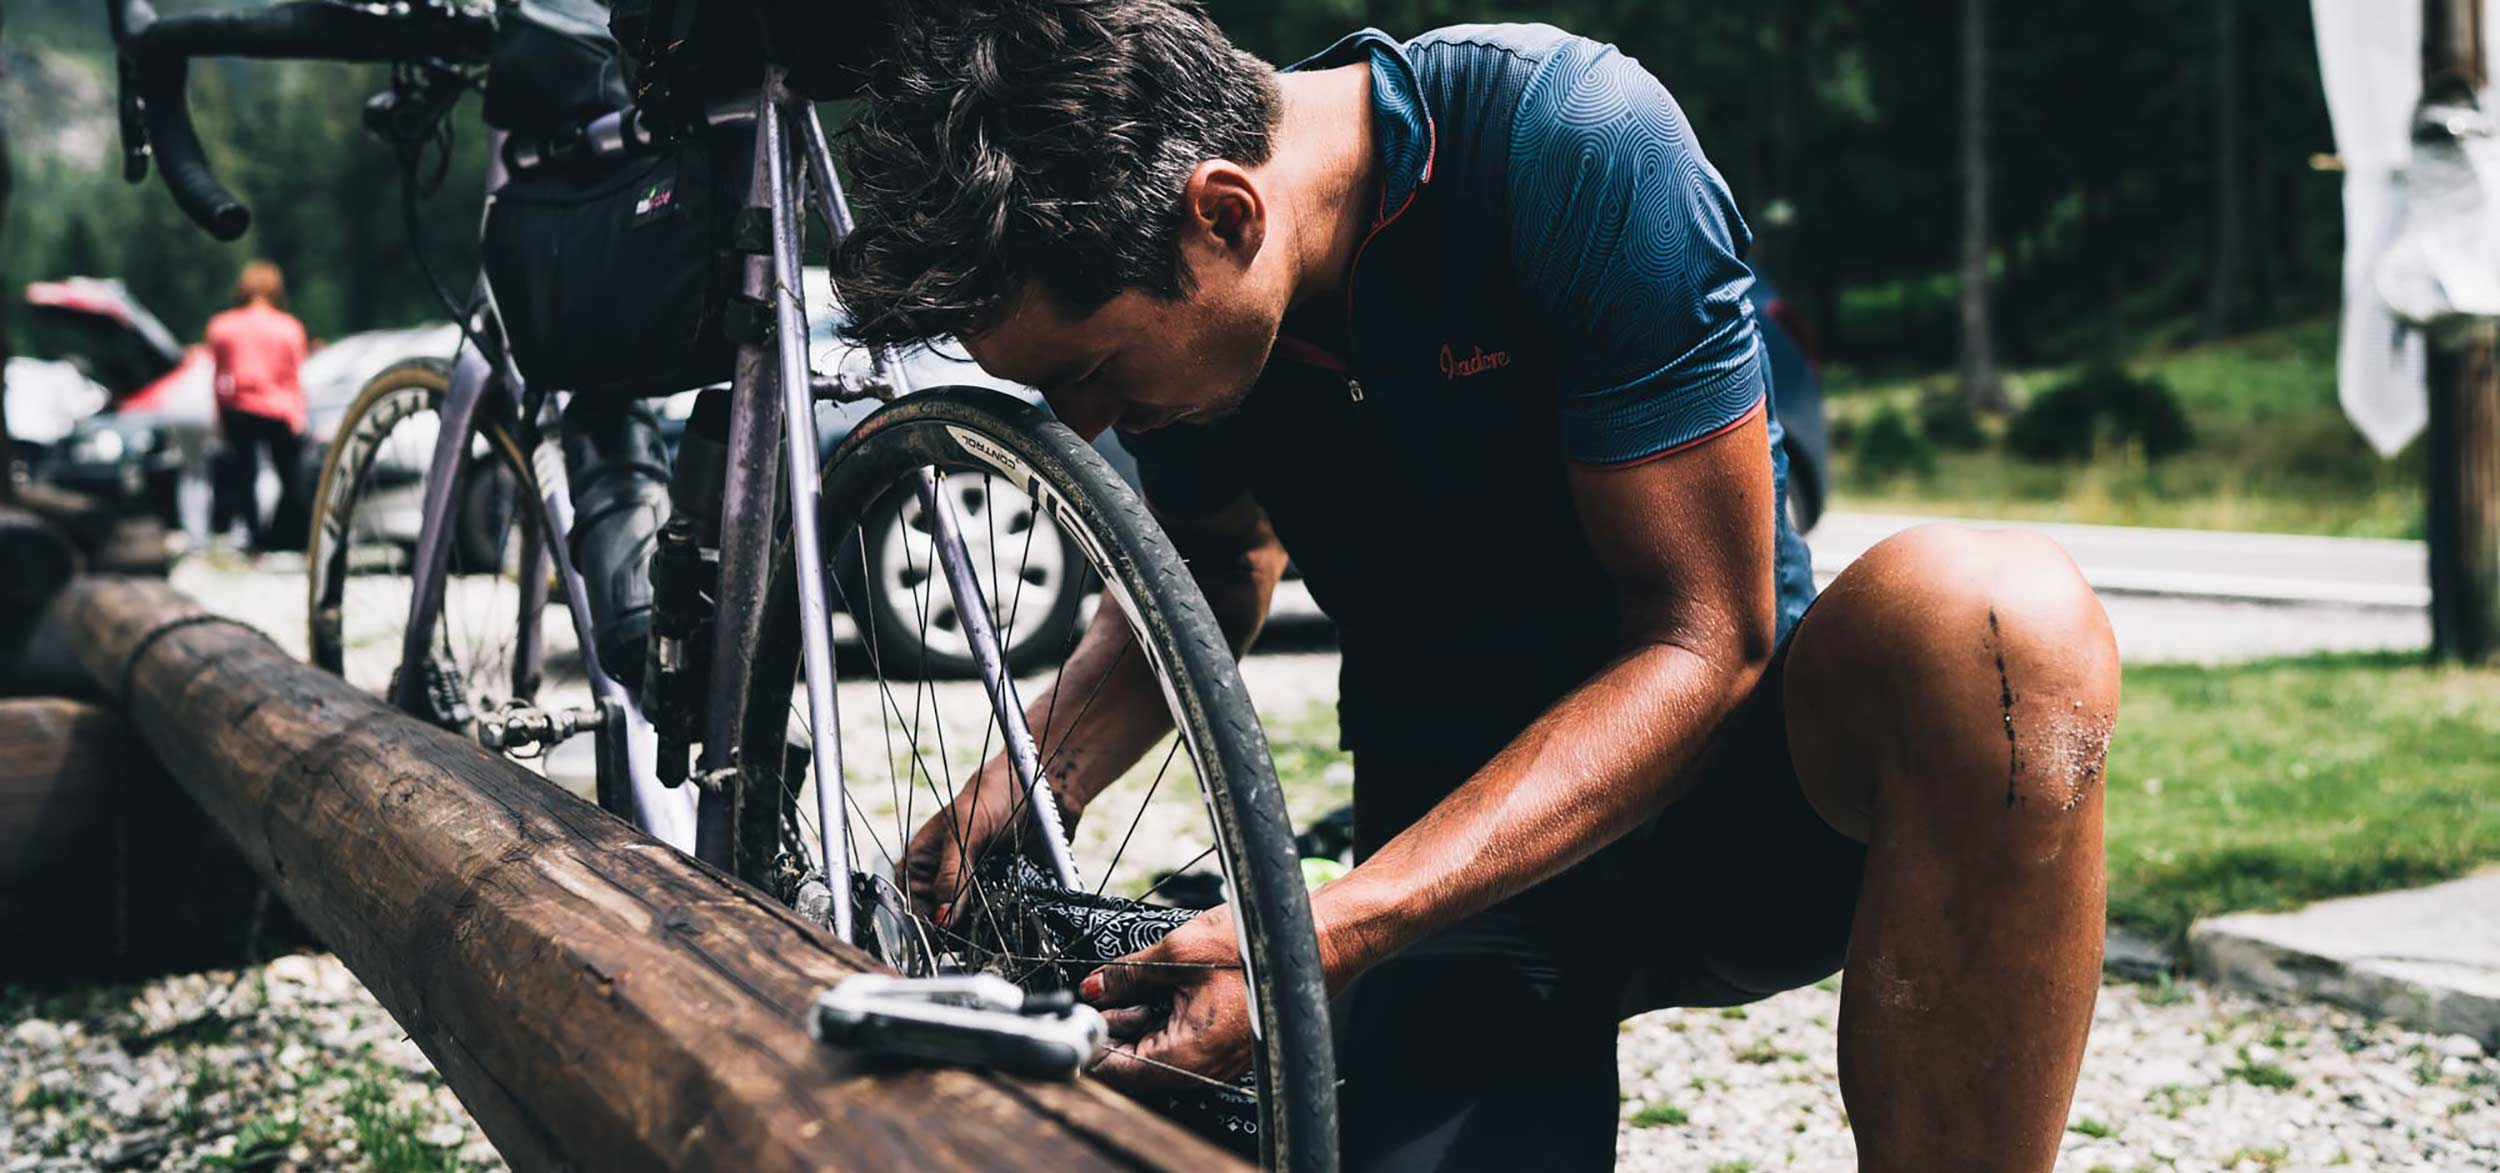 apidura-repairs-bike.jpg